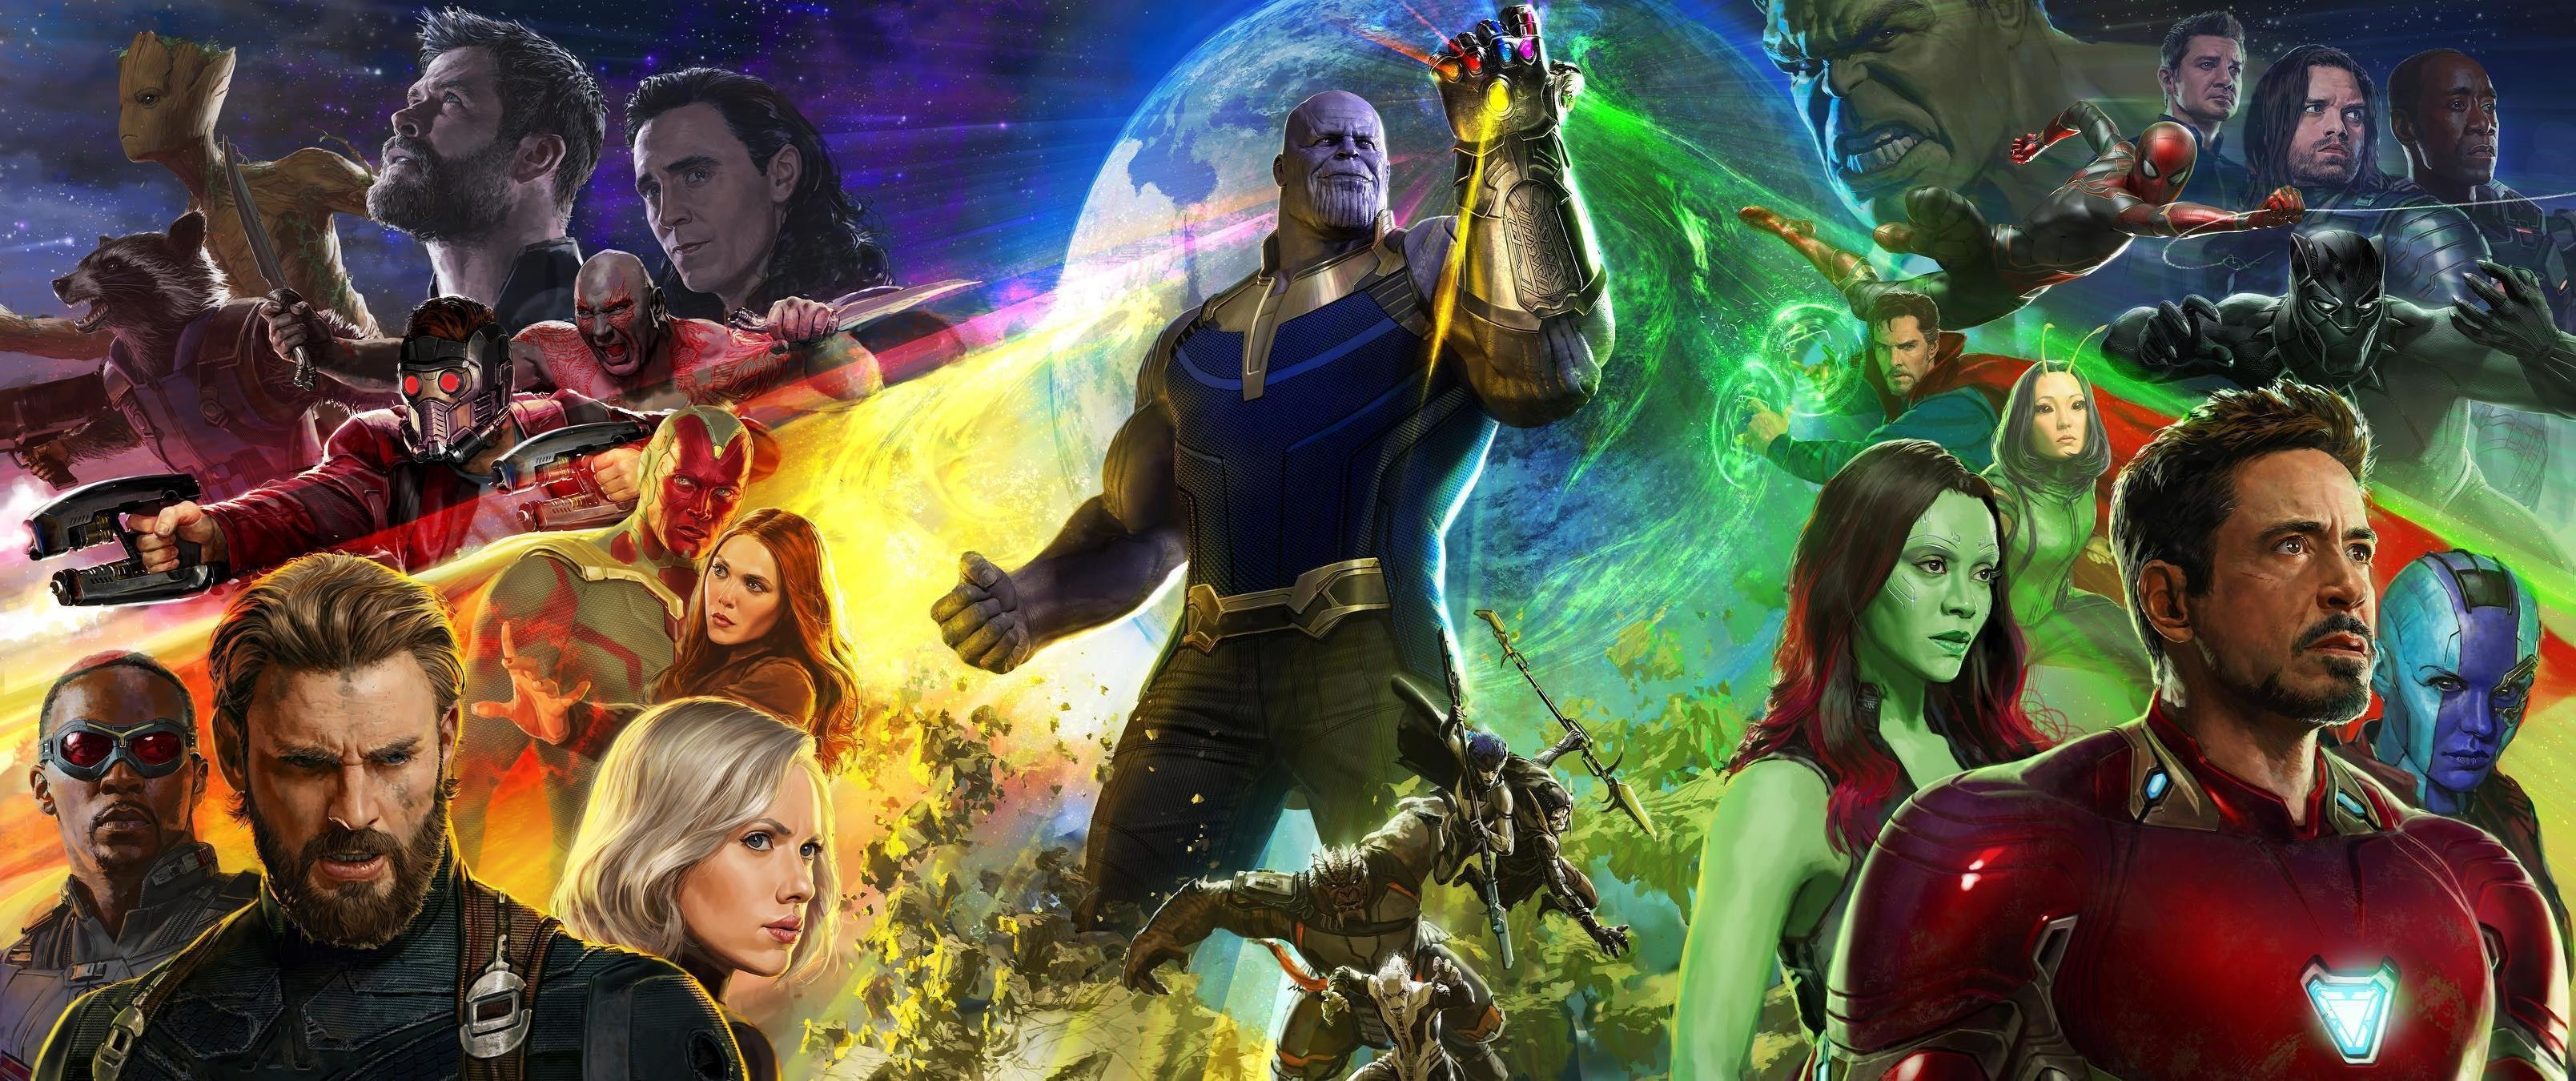 Beautiful Scott Lang Infinity War Wallpaper - avengers-infinity-war-poster-comic-con-1jpeg  Collection_607450 .jpeg?rect\u003d258%2C0%2C2702%2C1350\u0026auto\u003dformat%2Ccompress\u0026w\u003d650